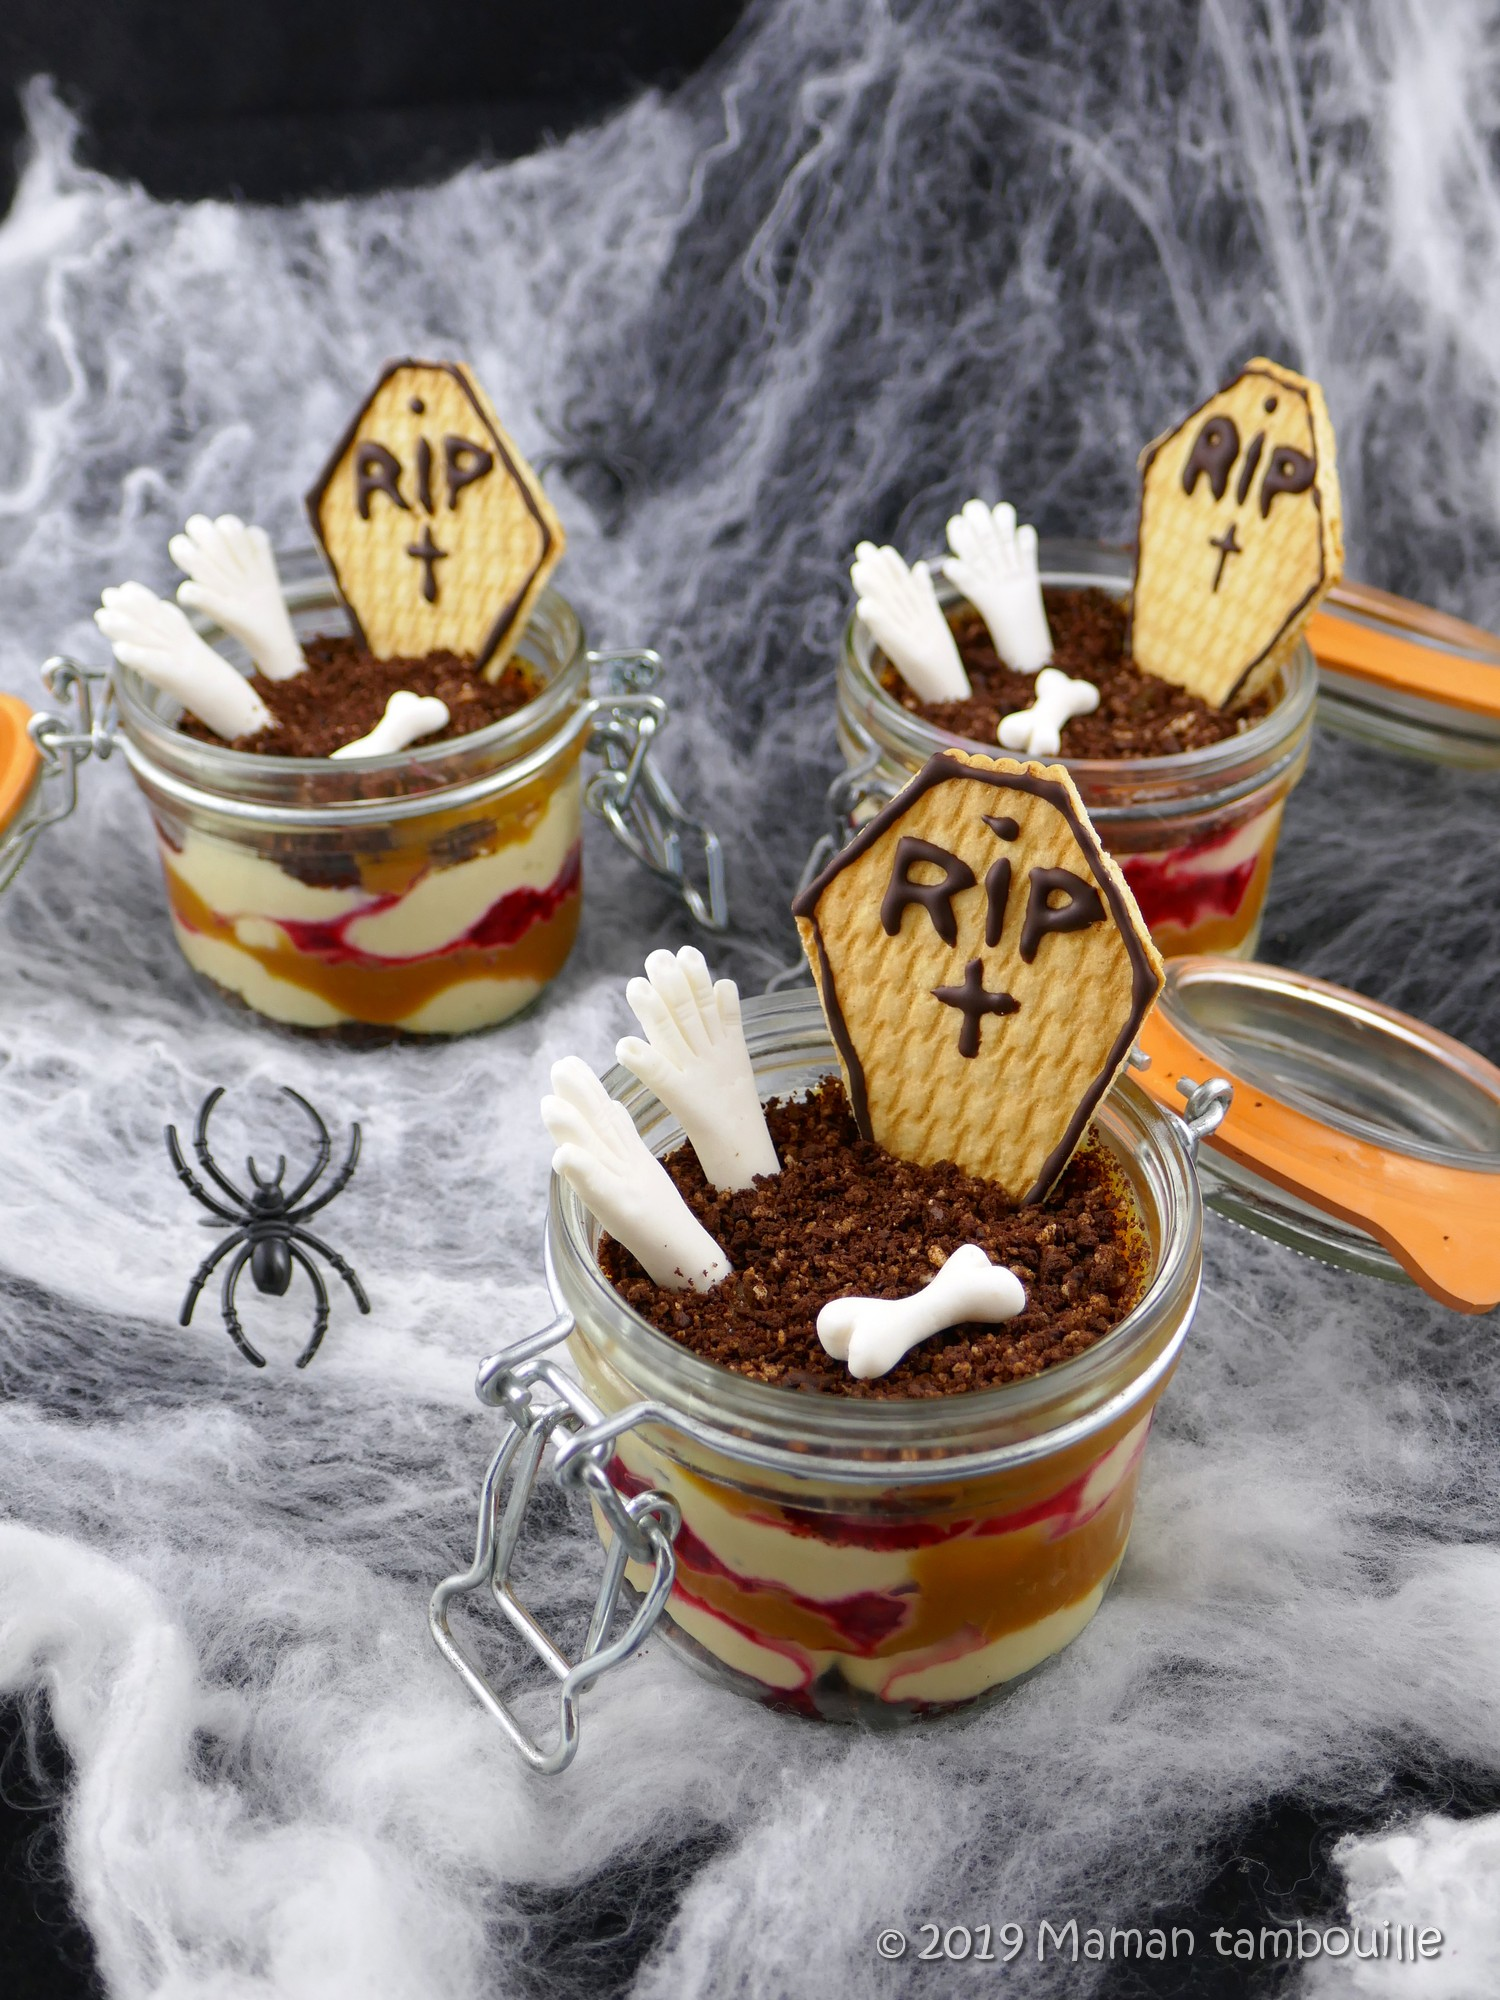 Verrine d'halloween crémeux tonka, caramel et framboises